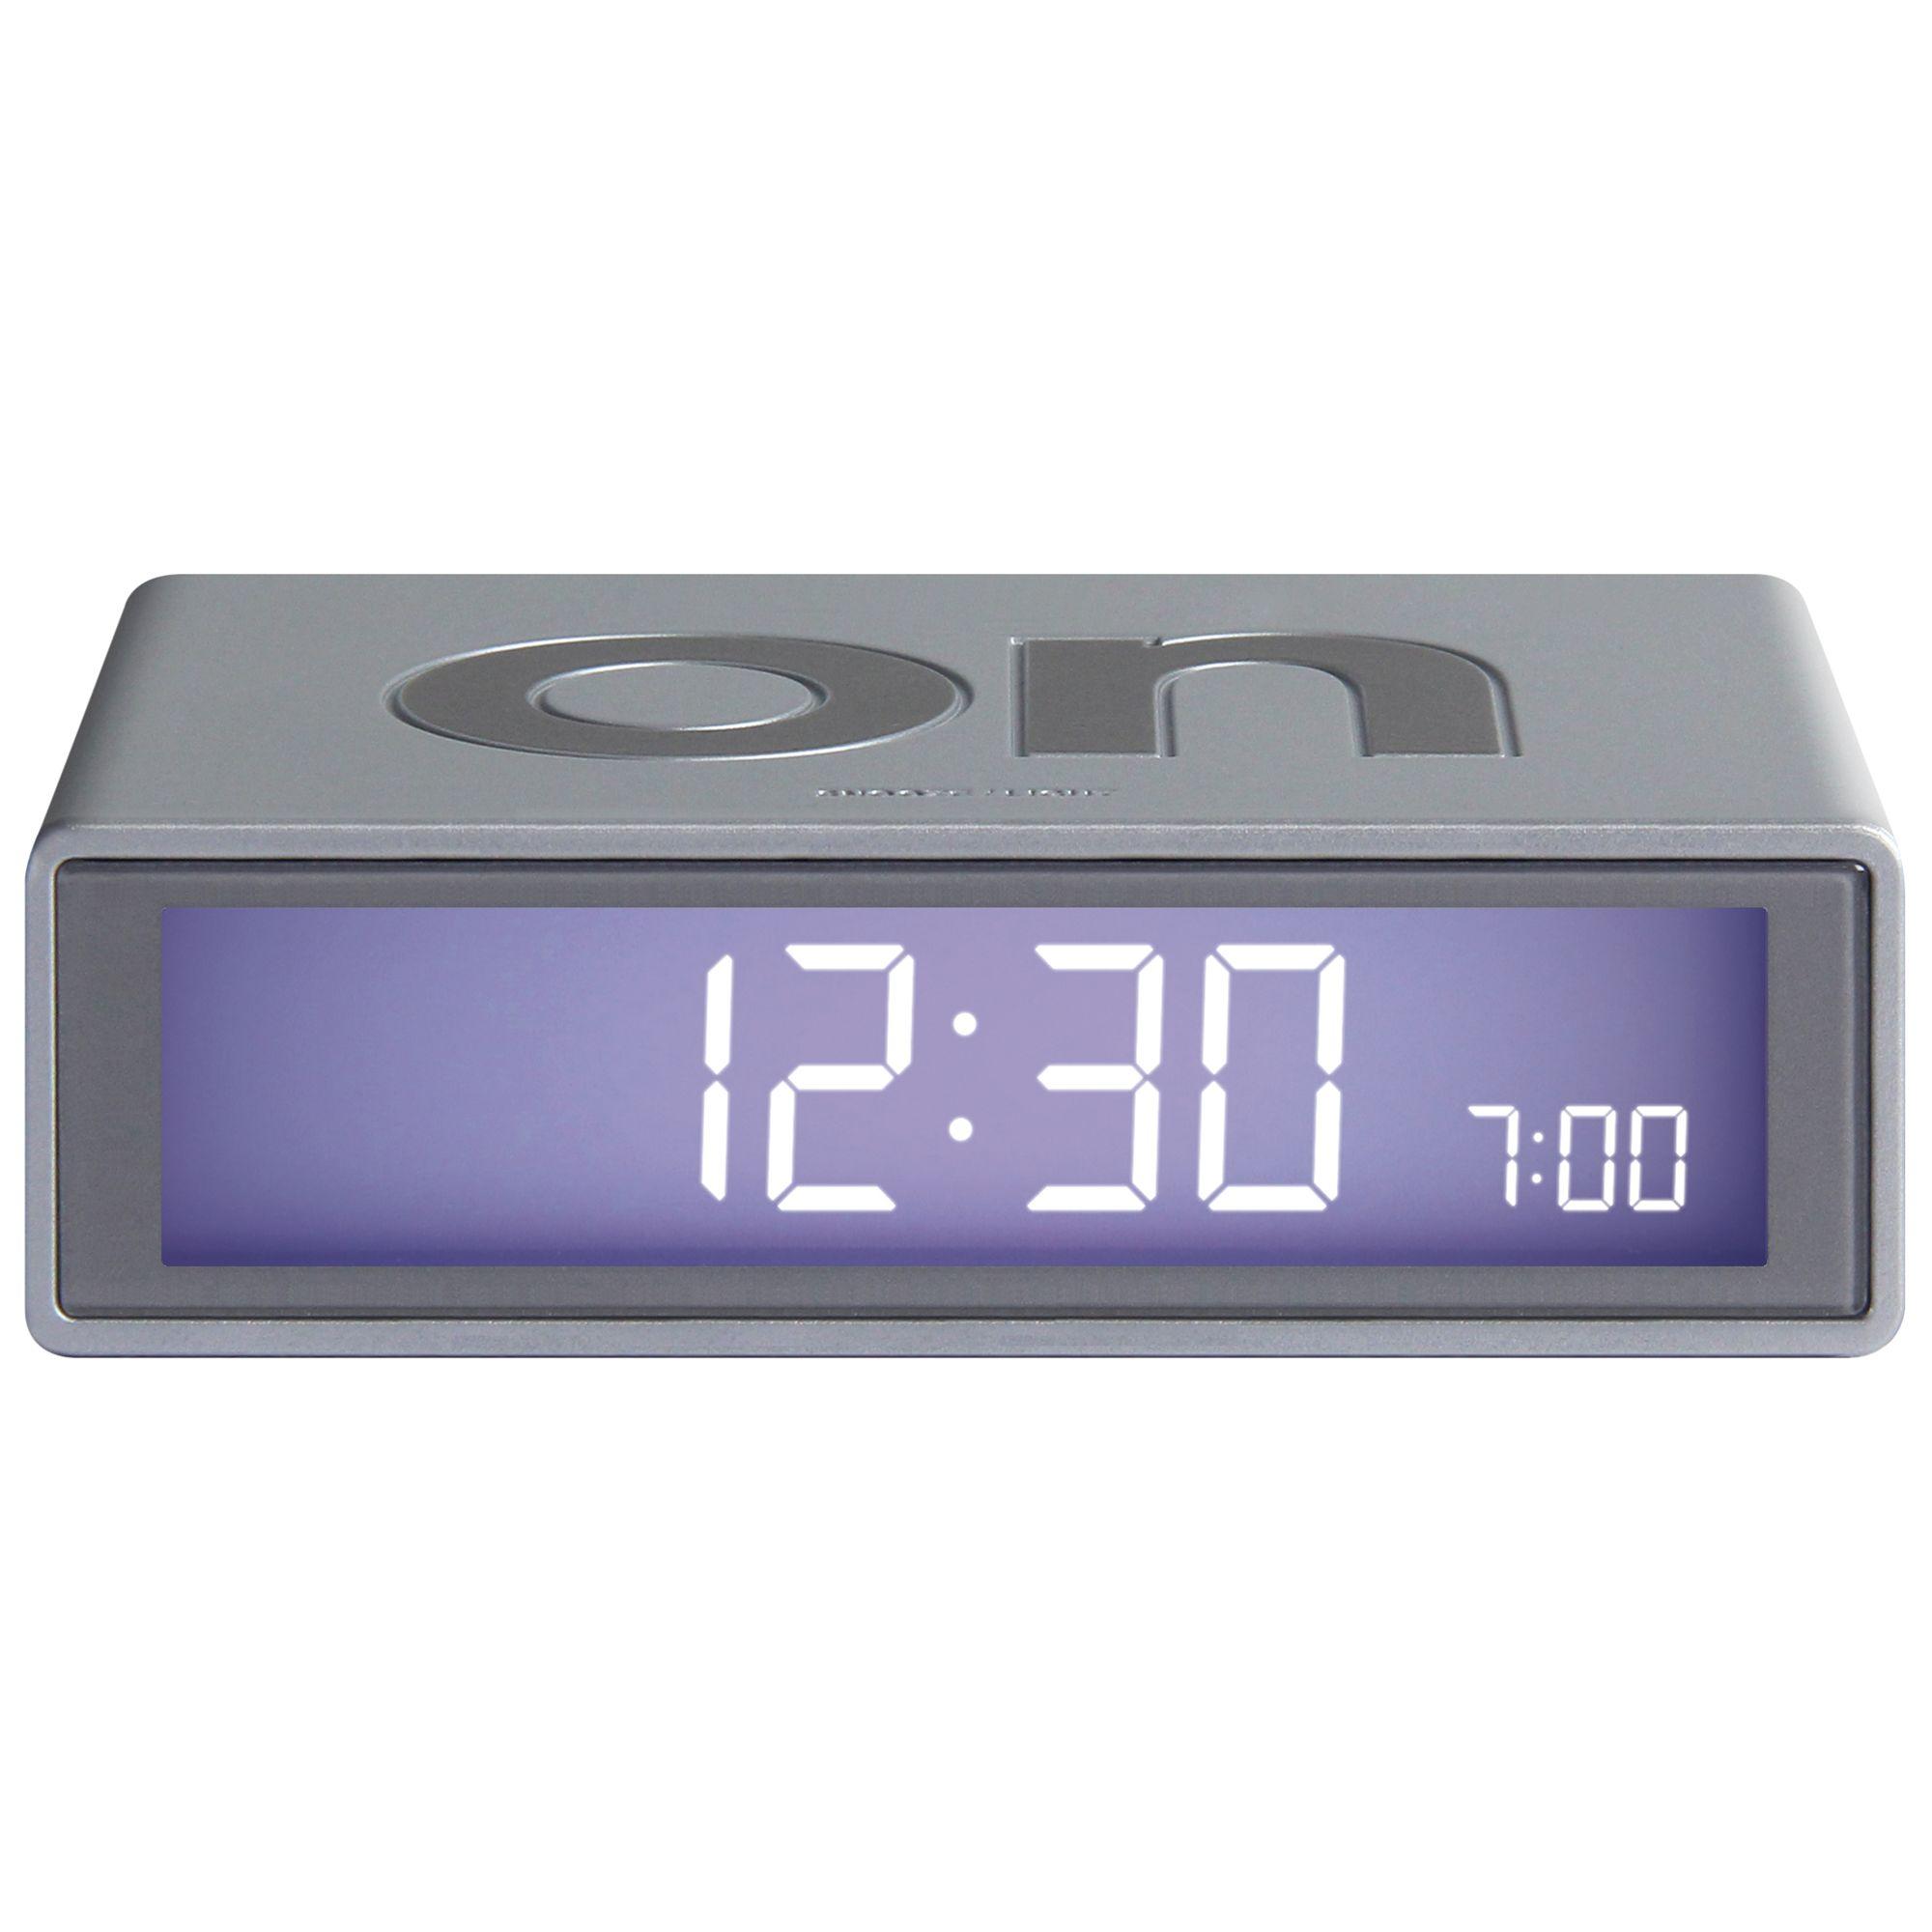 Lexon Dark Grey Mini FLIP LCD Bedside Travel Alarm Clock with Snooze